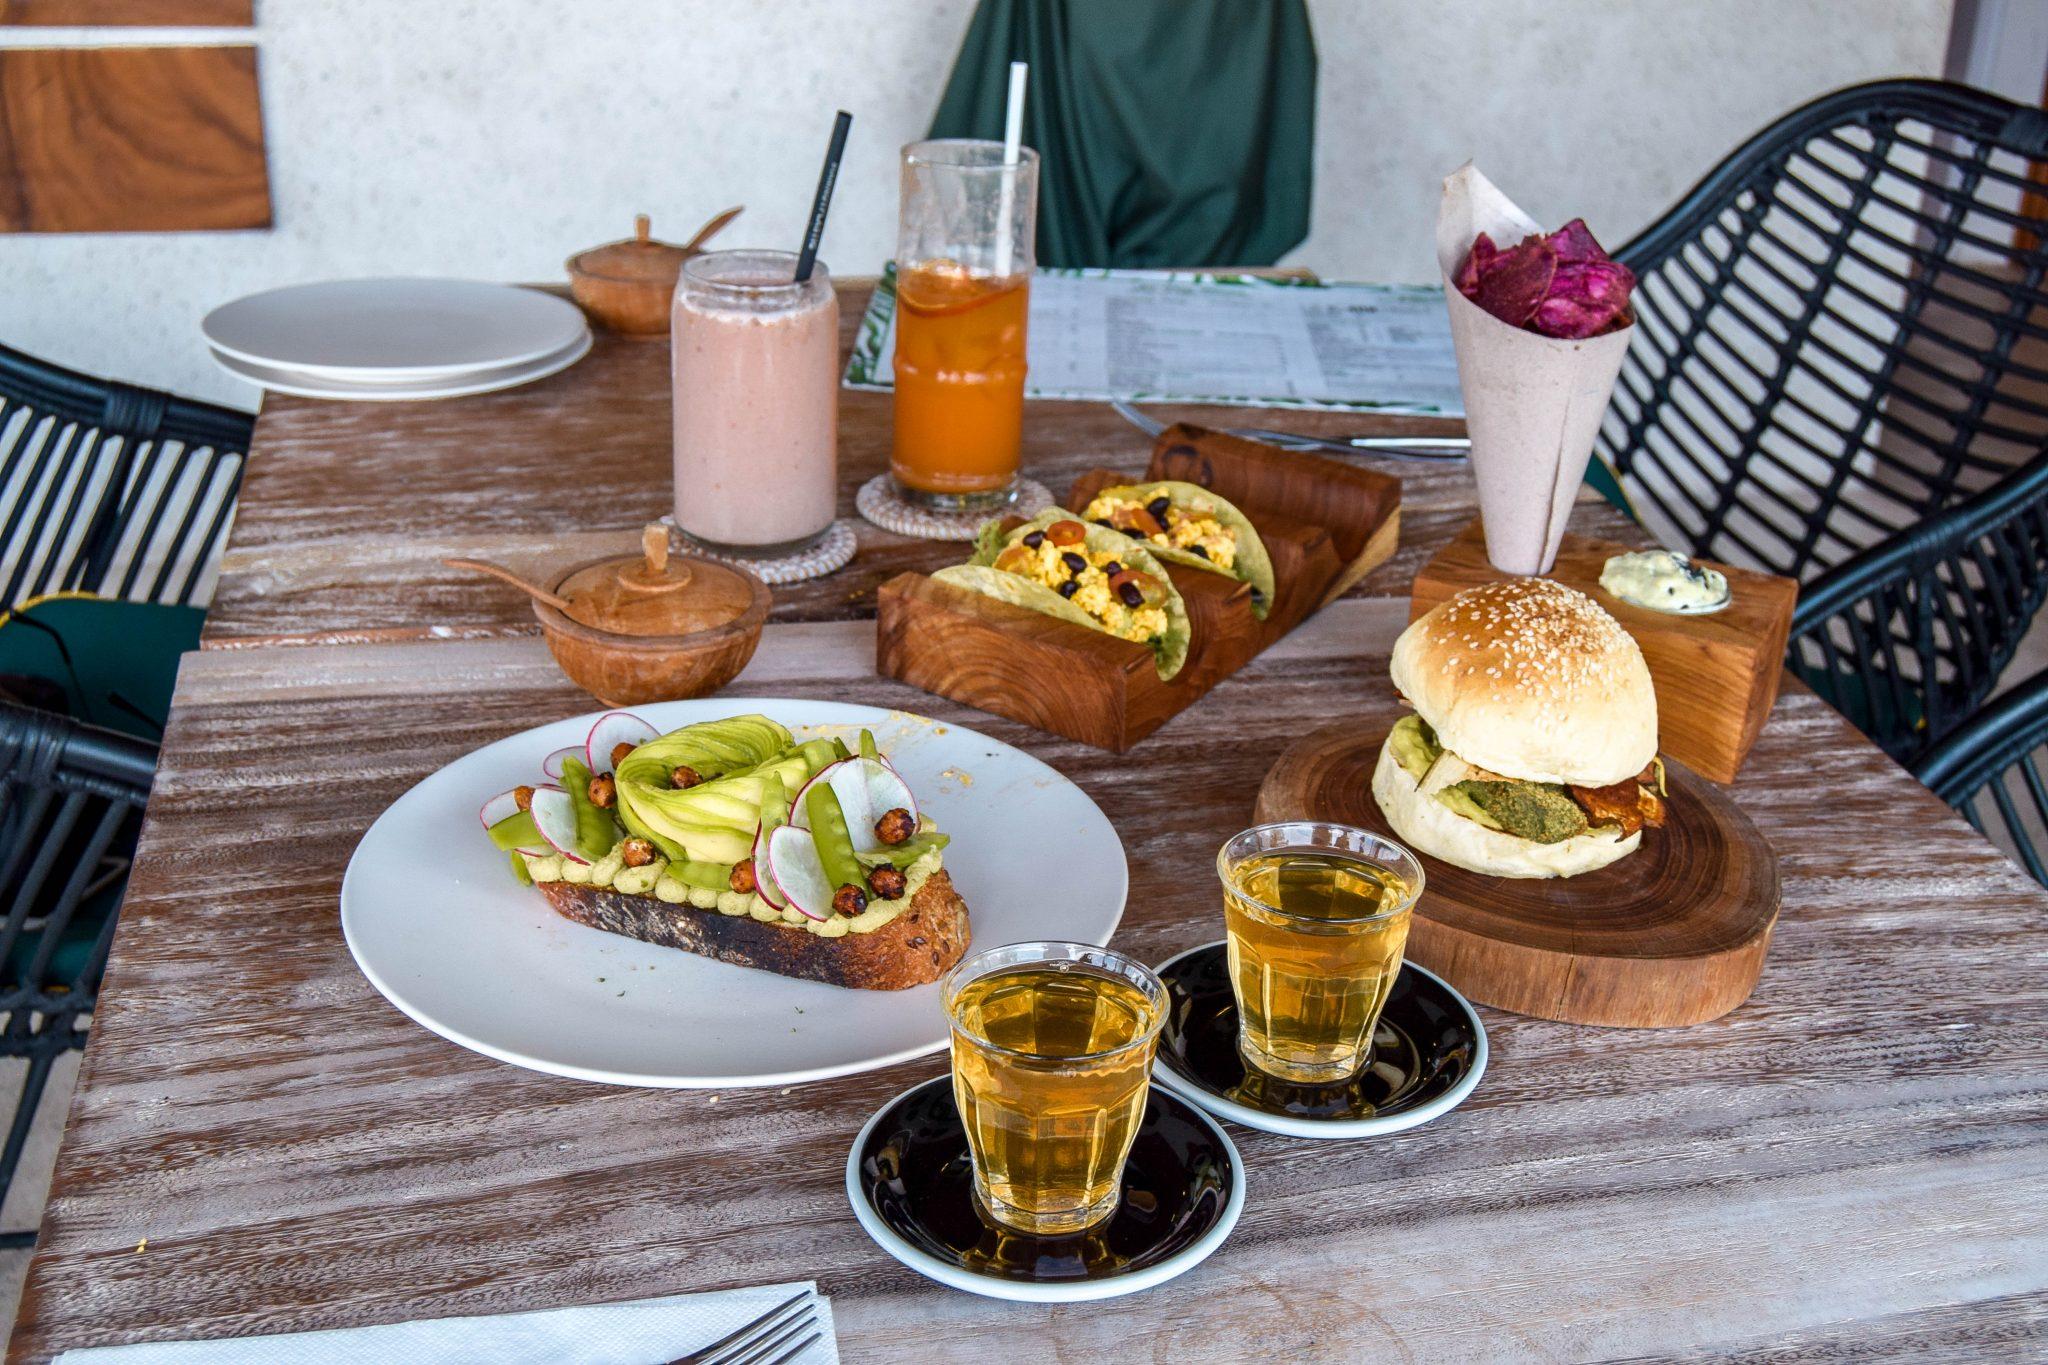 Wanderers & Warriors - The Avocado Factory Canggu - Best Restaurants In Canggu Restaurants